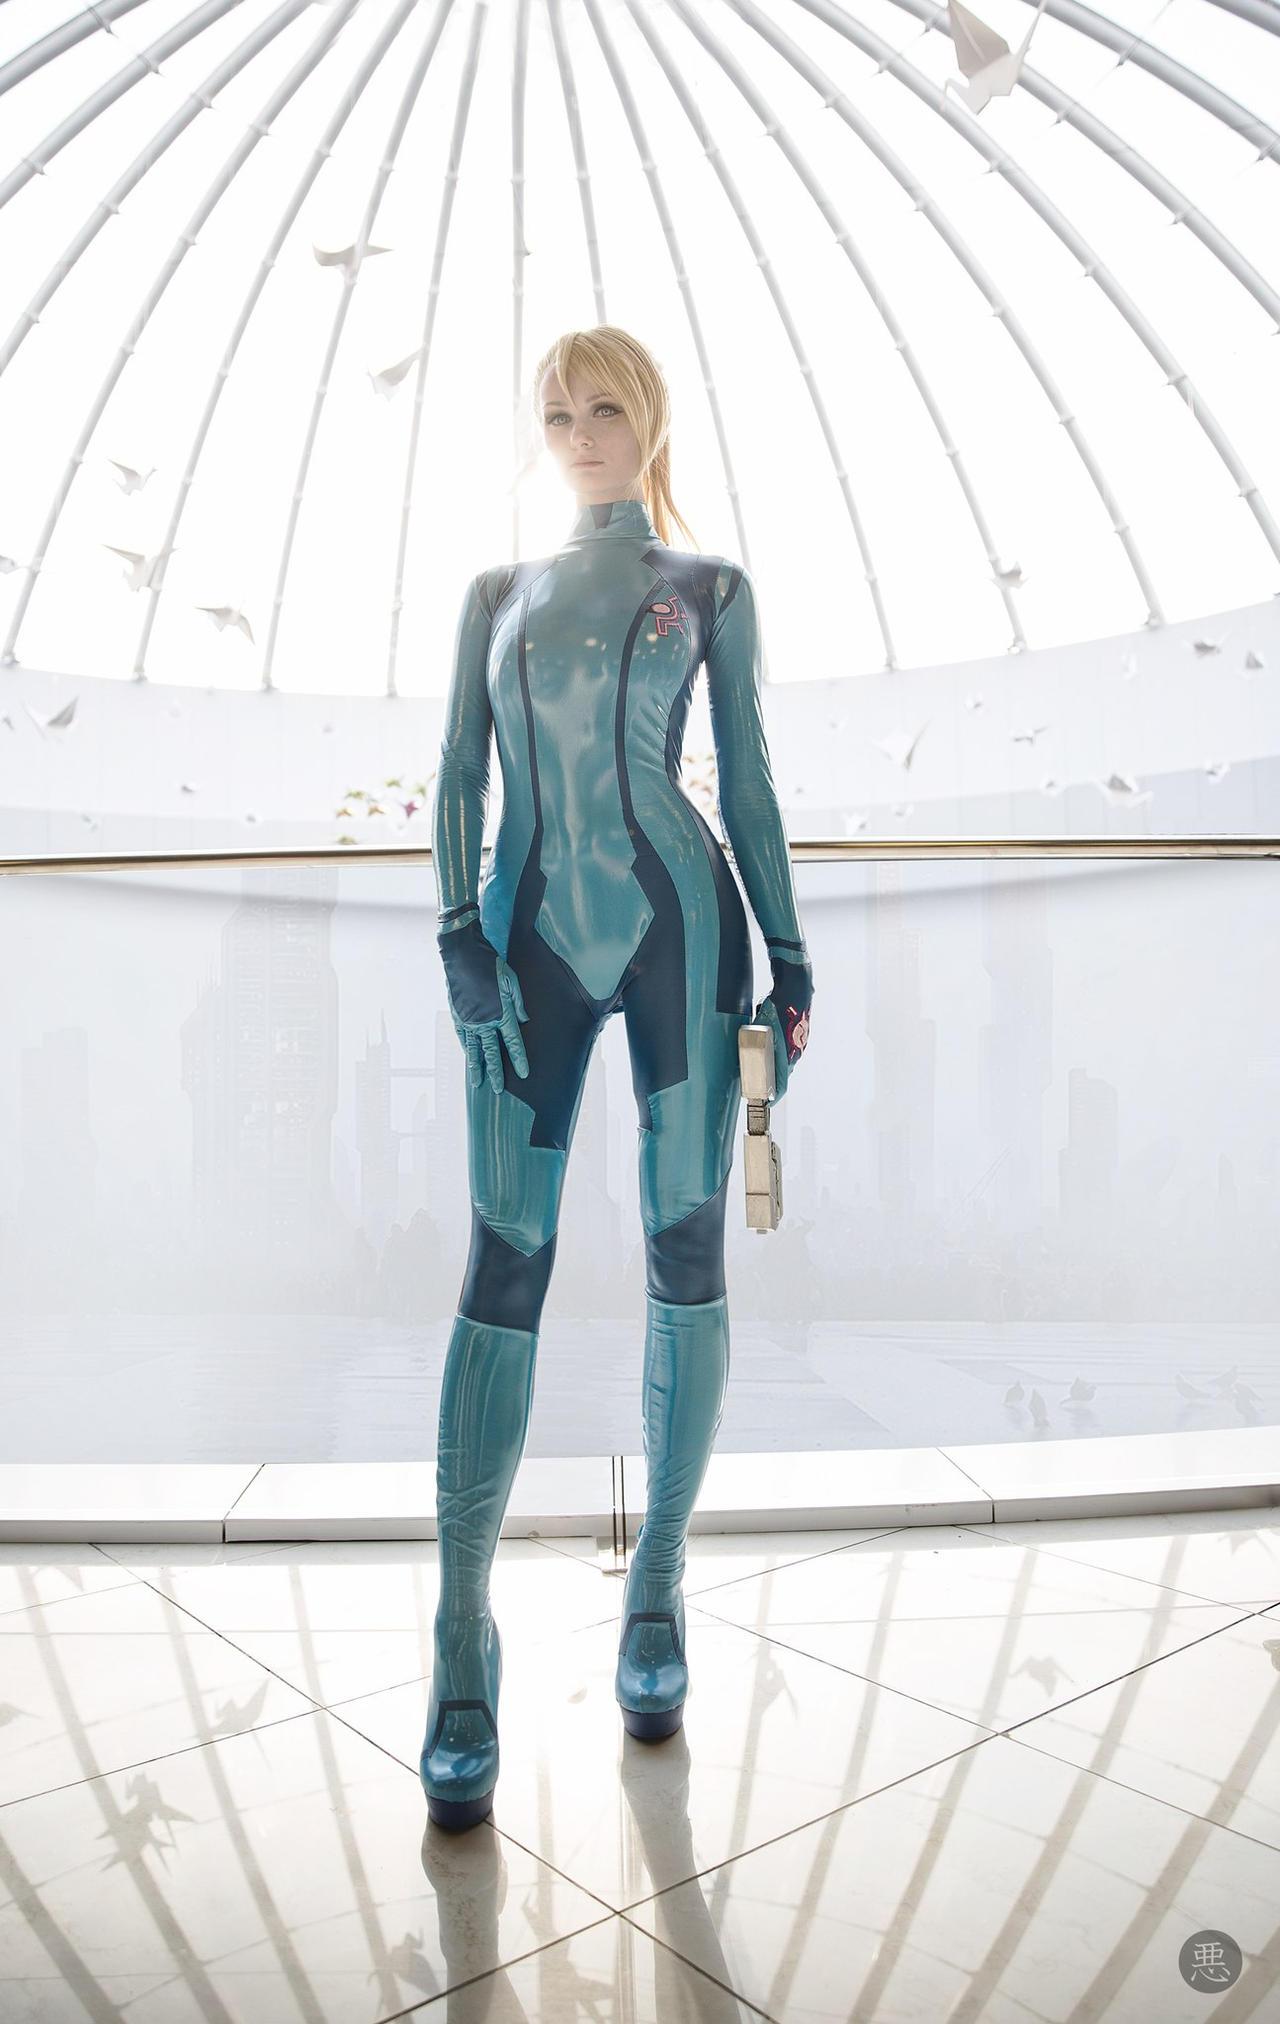 Zero Suit Samus by tniwe